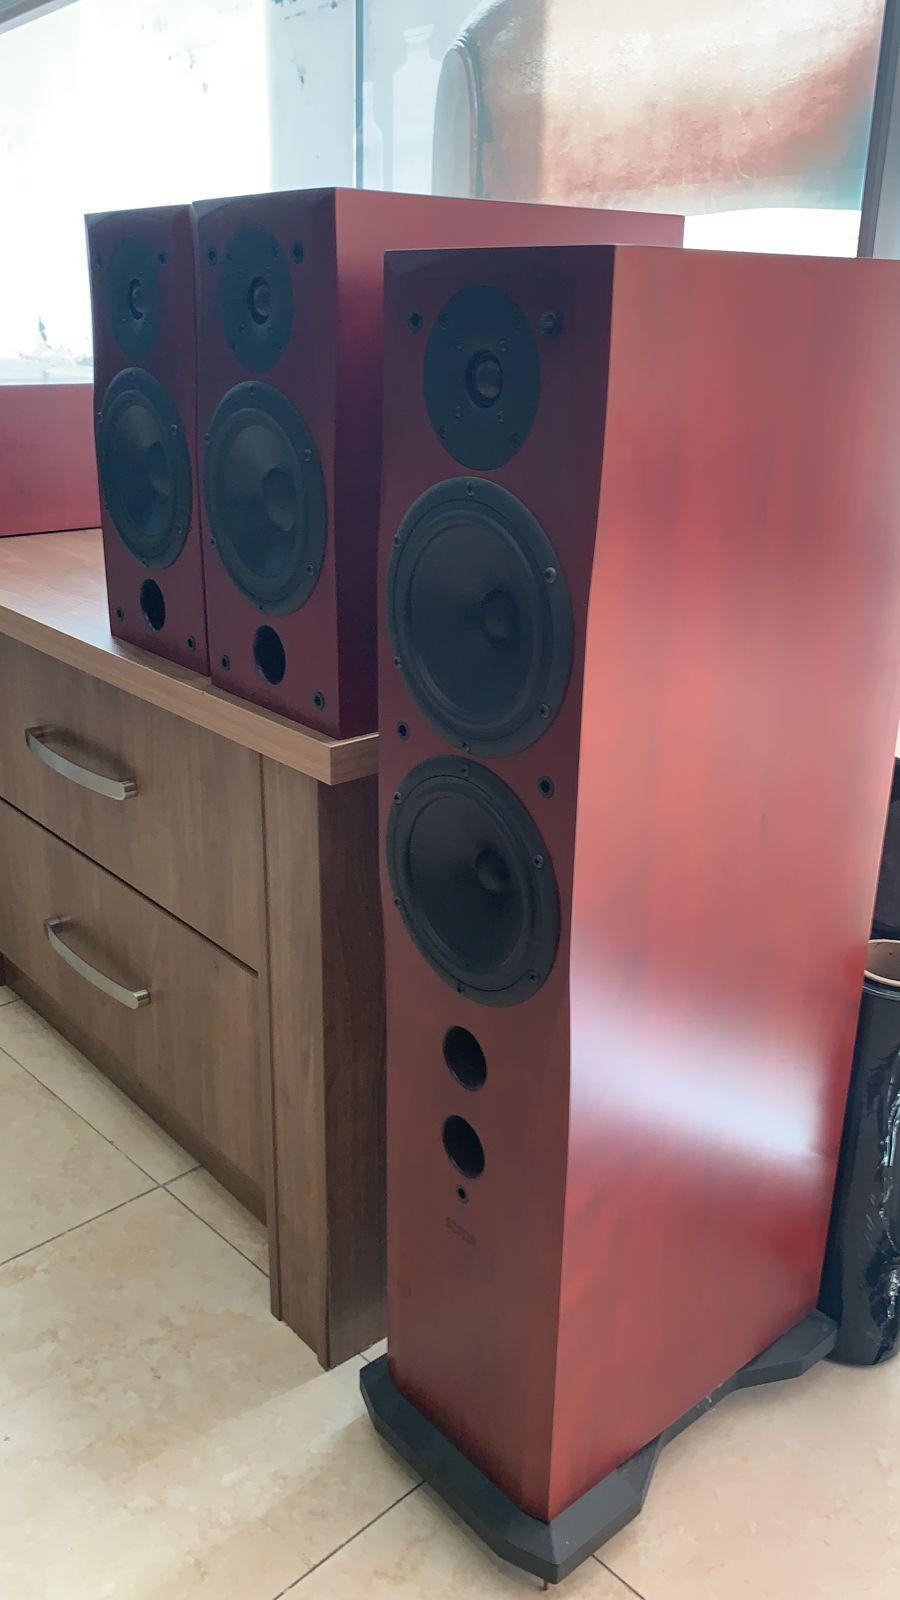 SONOR AUDIO 7.0 HOME THEATRE LOUDSPEAKERS